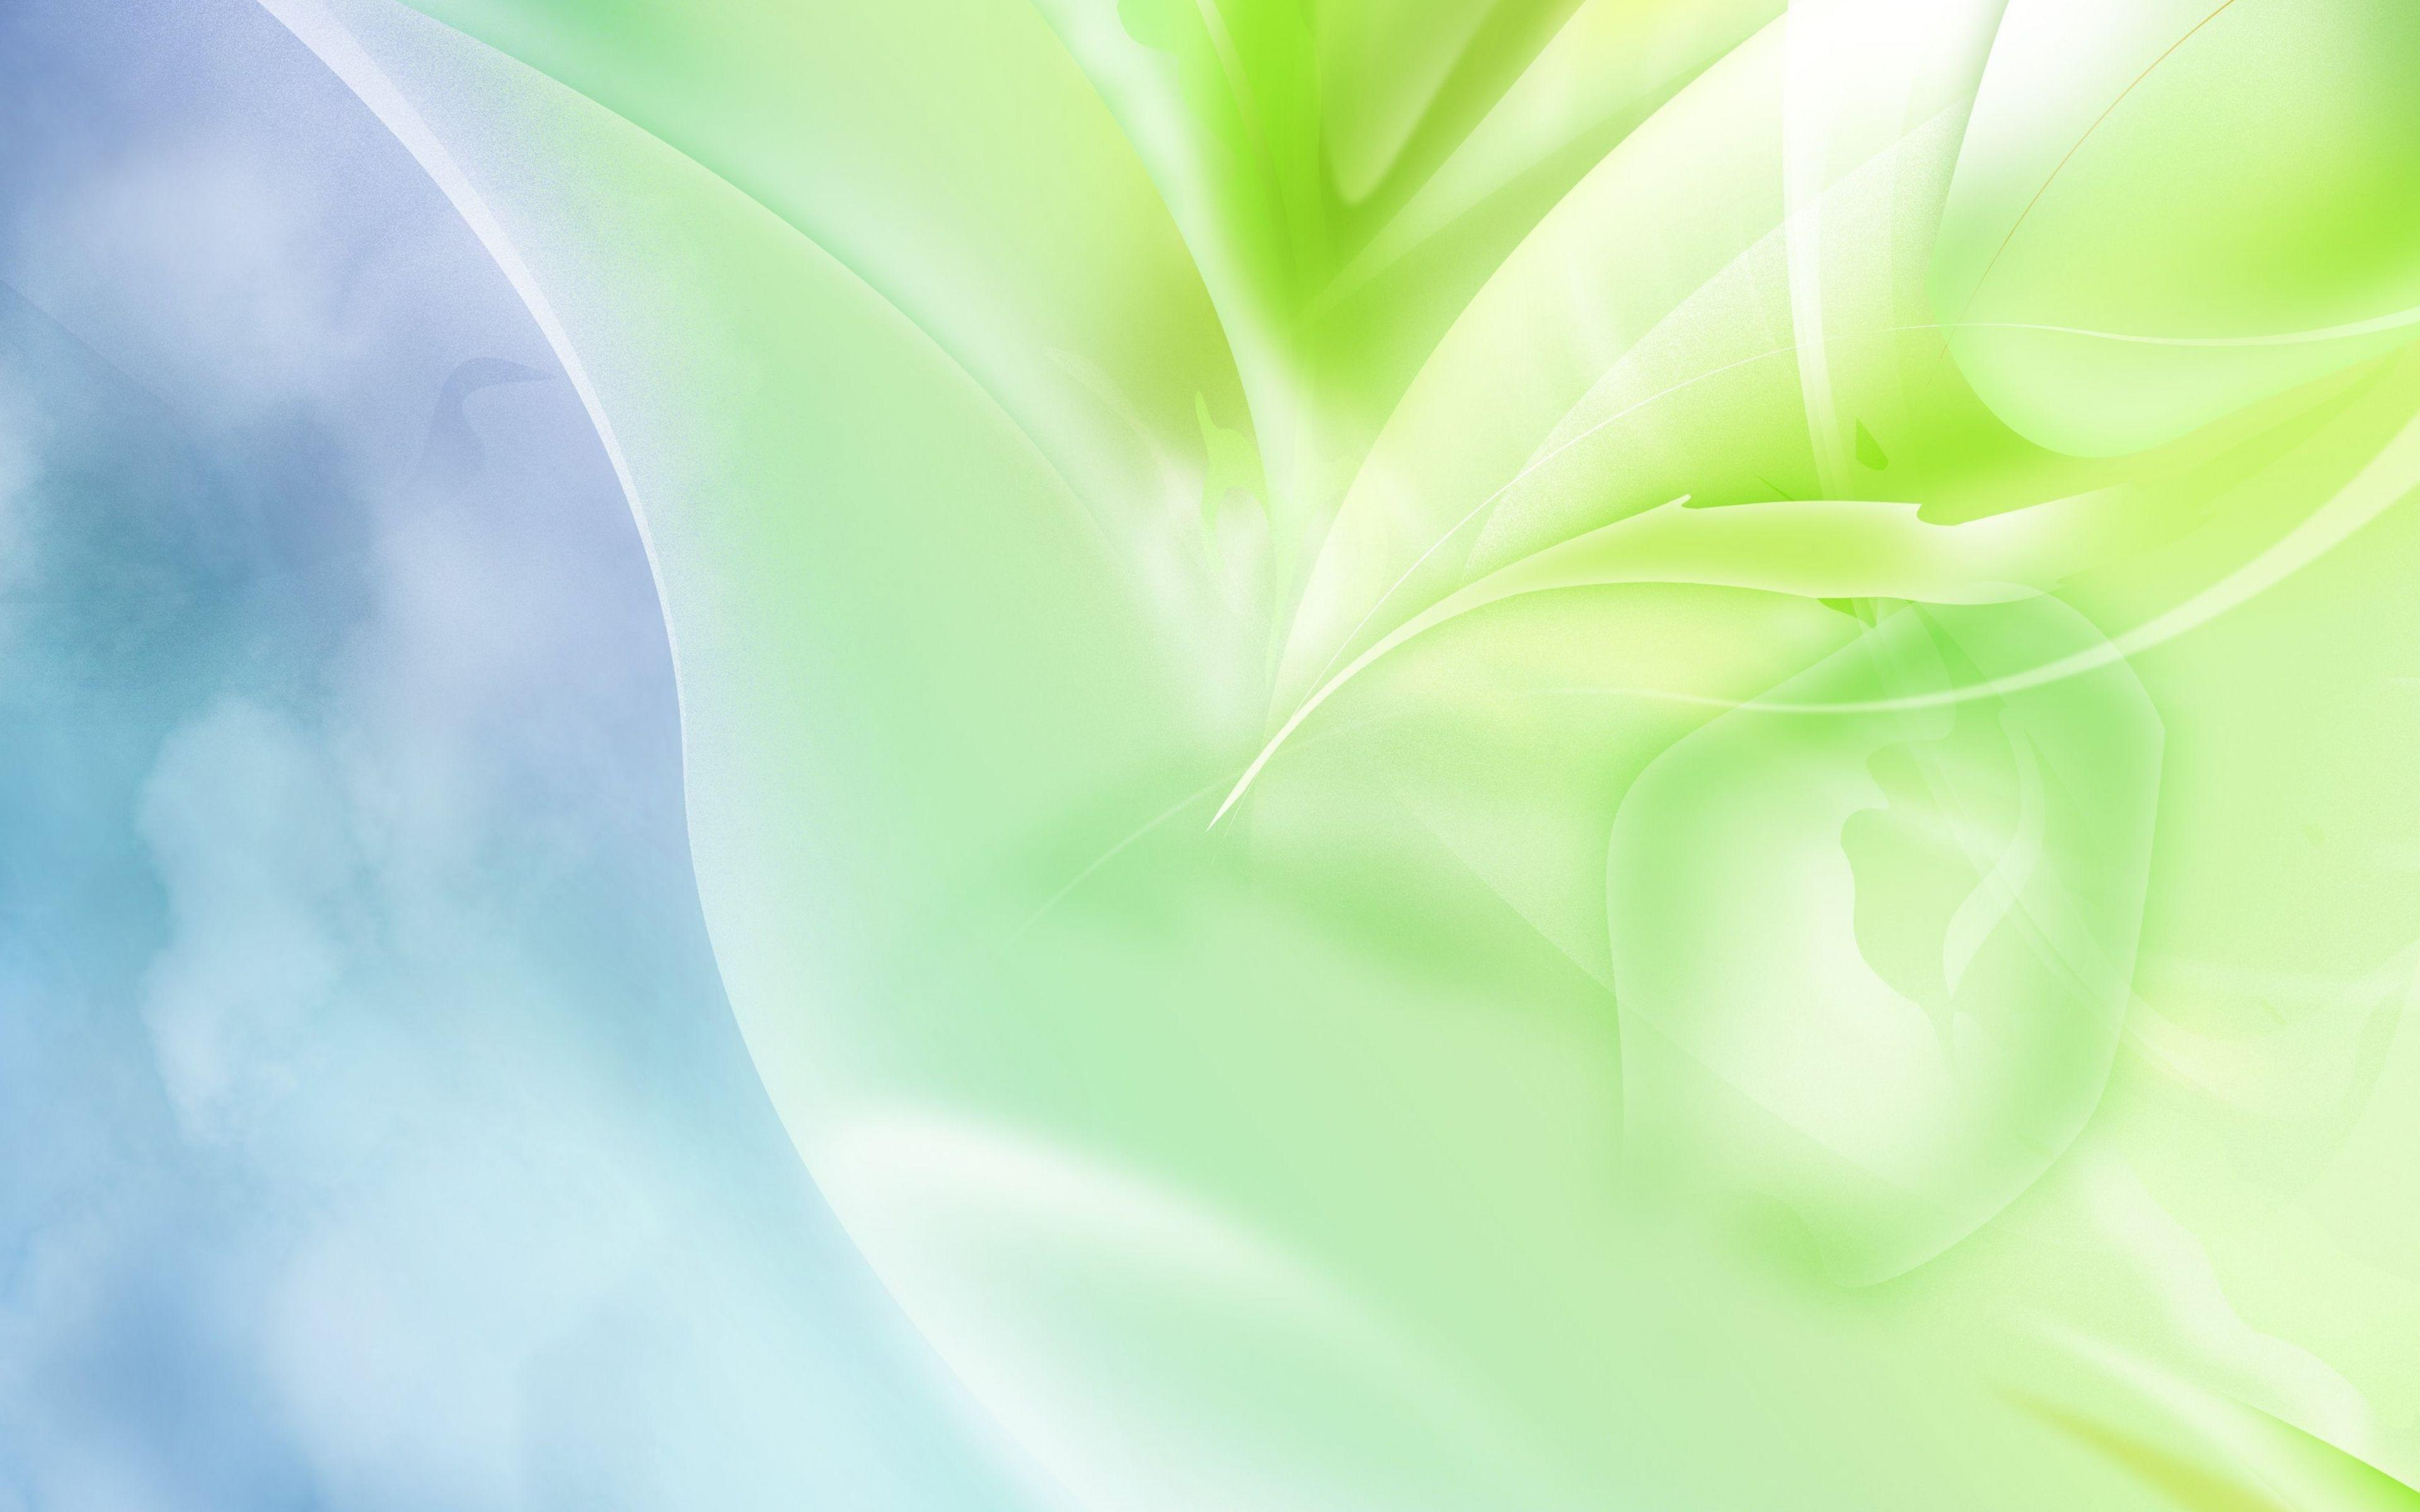 Light green wallpapers iphone for desktop background 3840x2400 px light green wallpapers iphone for desktop background 3840x2400 px 145 mb aloadofball Image collections